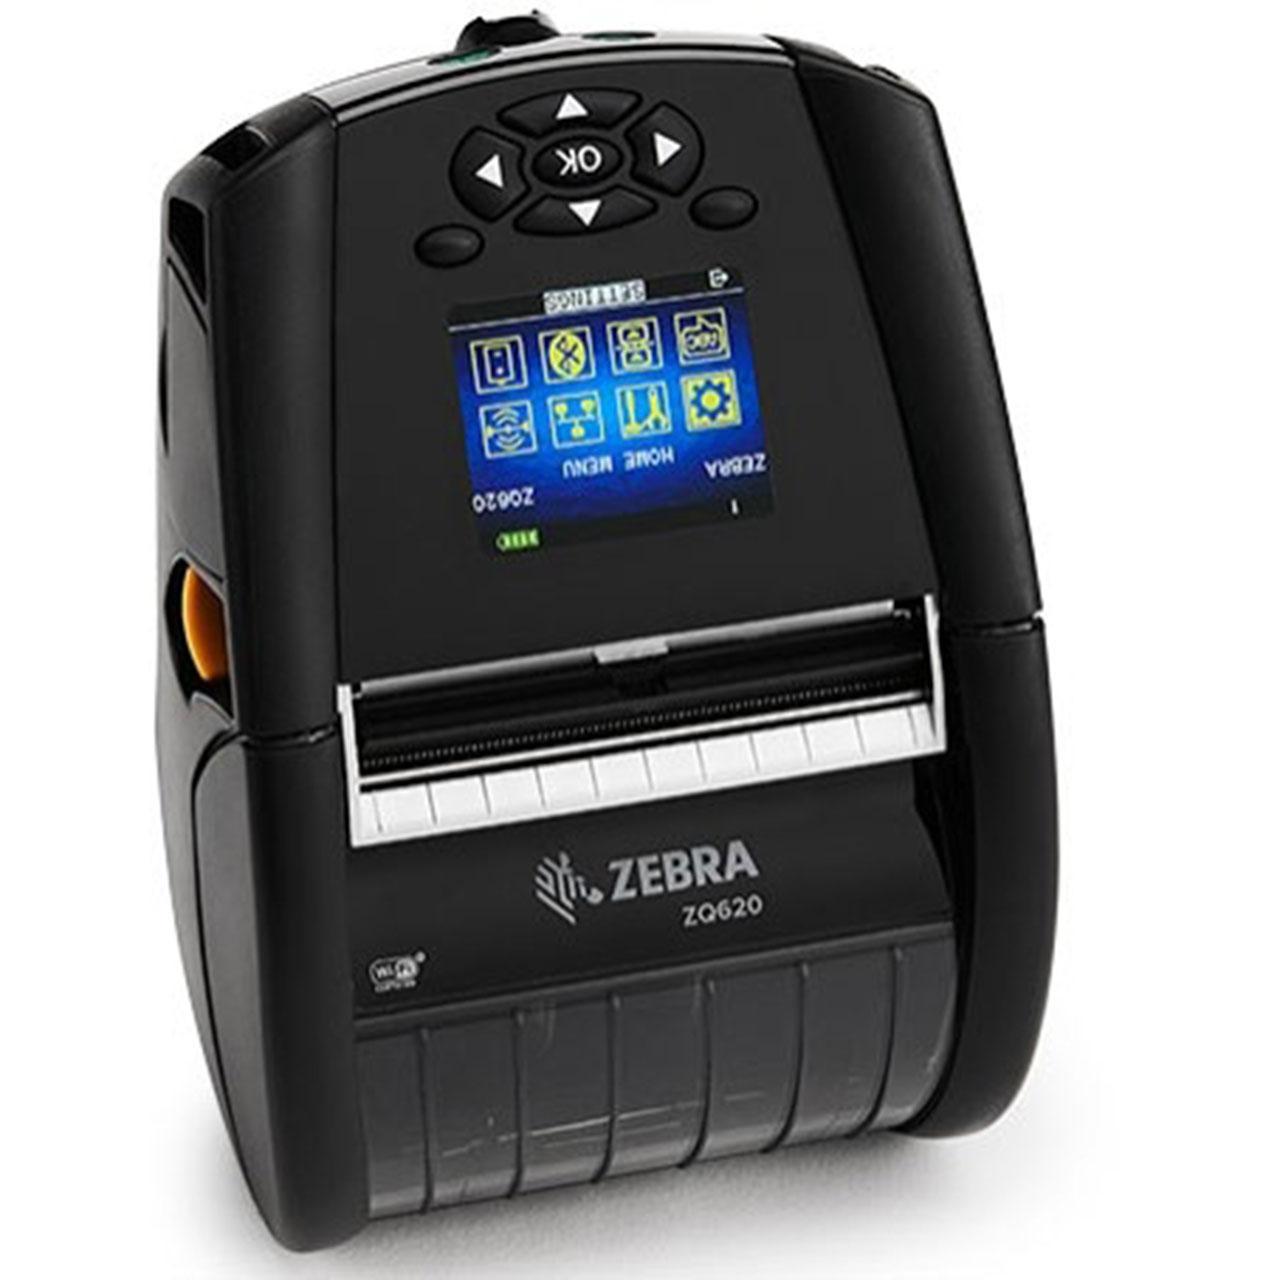 "Zebra DT Printer ZQ620 3""/72mm; English fonts,BT 4.x, Linered platen, 0.75"" core, Group E, Shoulder strap, Belt clip, Media Width Sen"